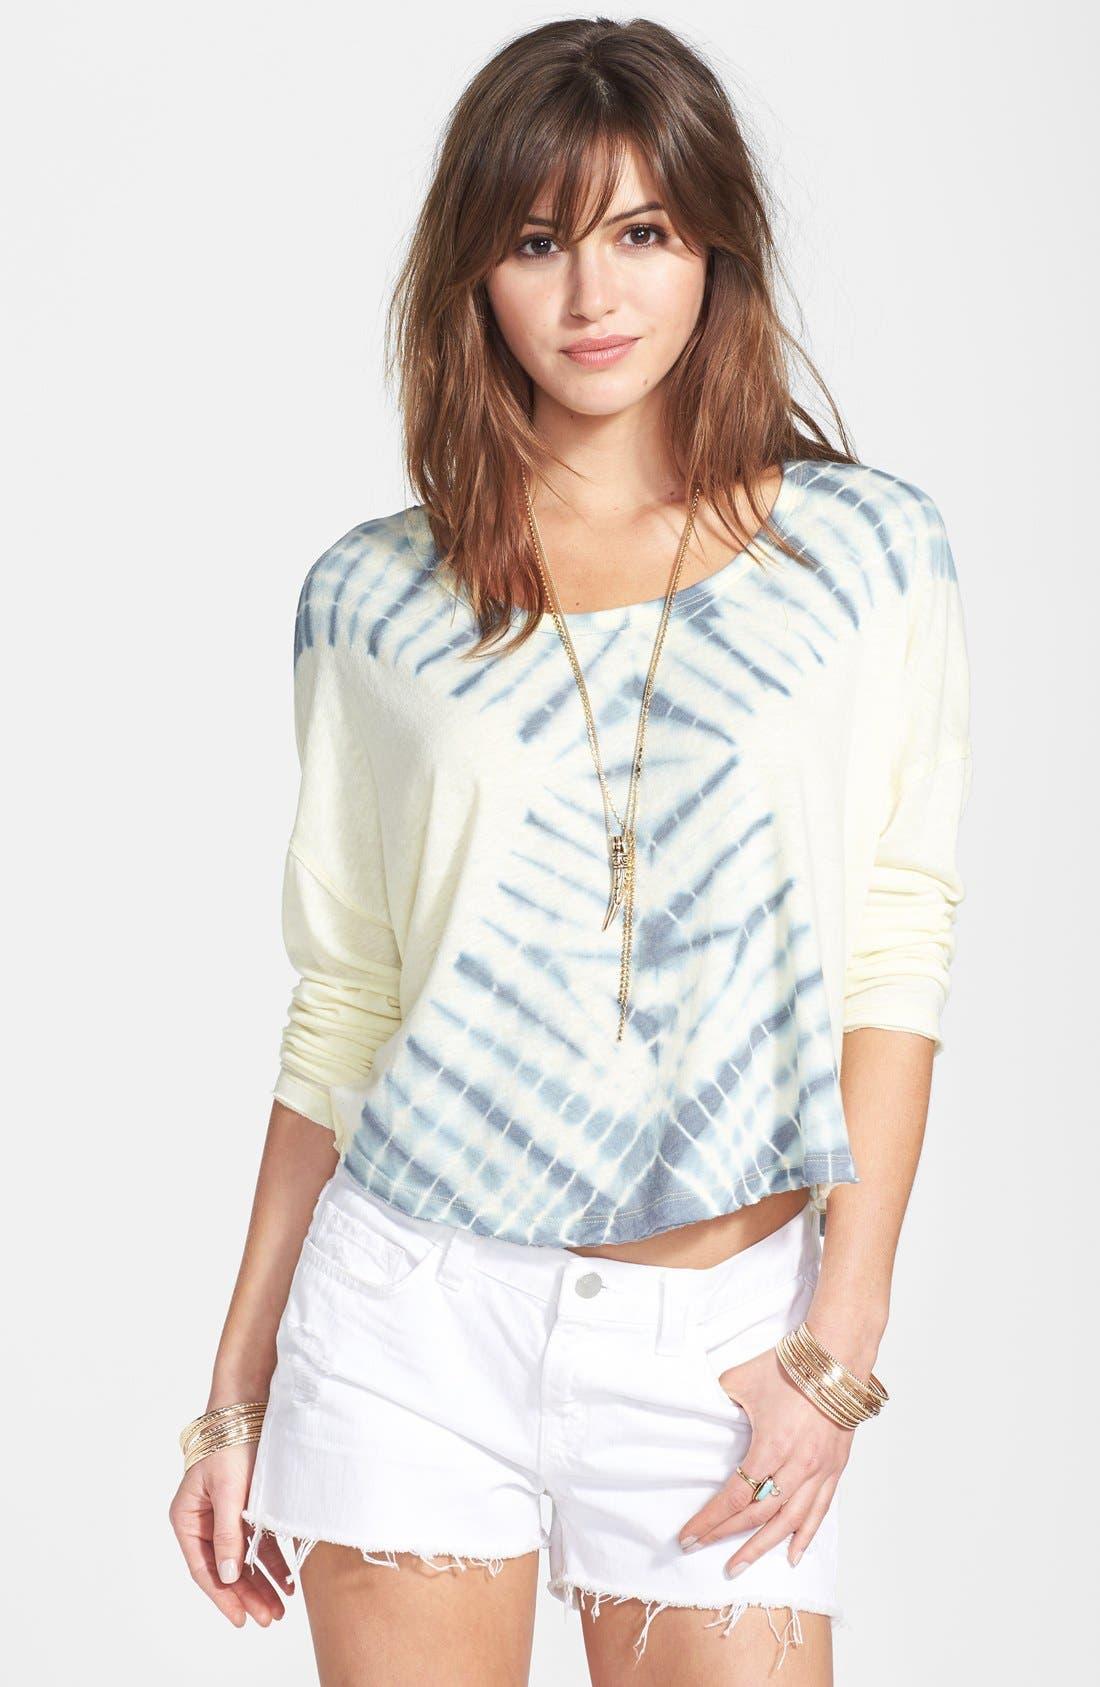 Alternate Image 1 Selected - Free People 'Sundown' Tie Dye Cotton Blend Top